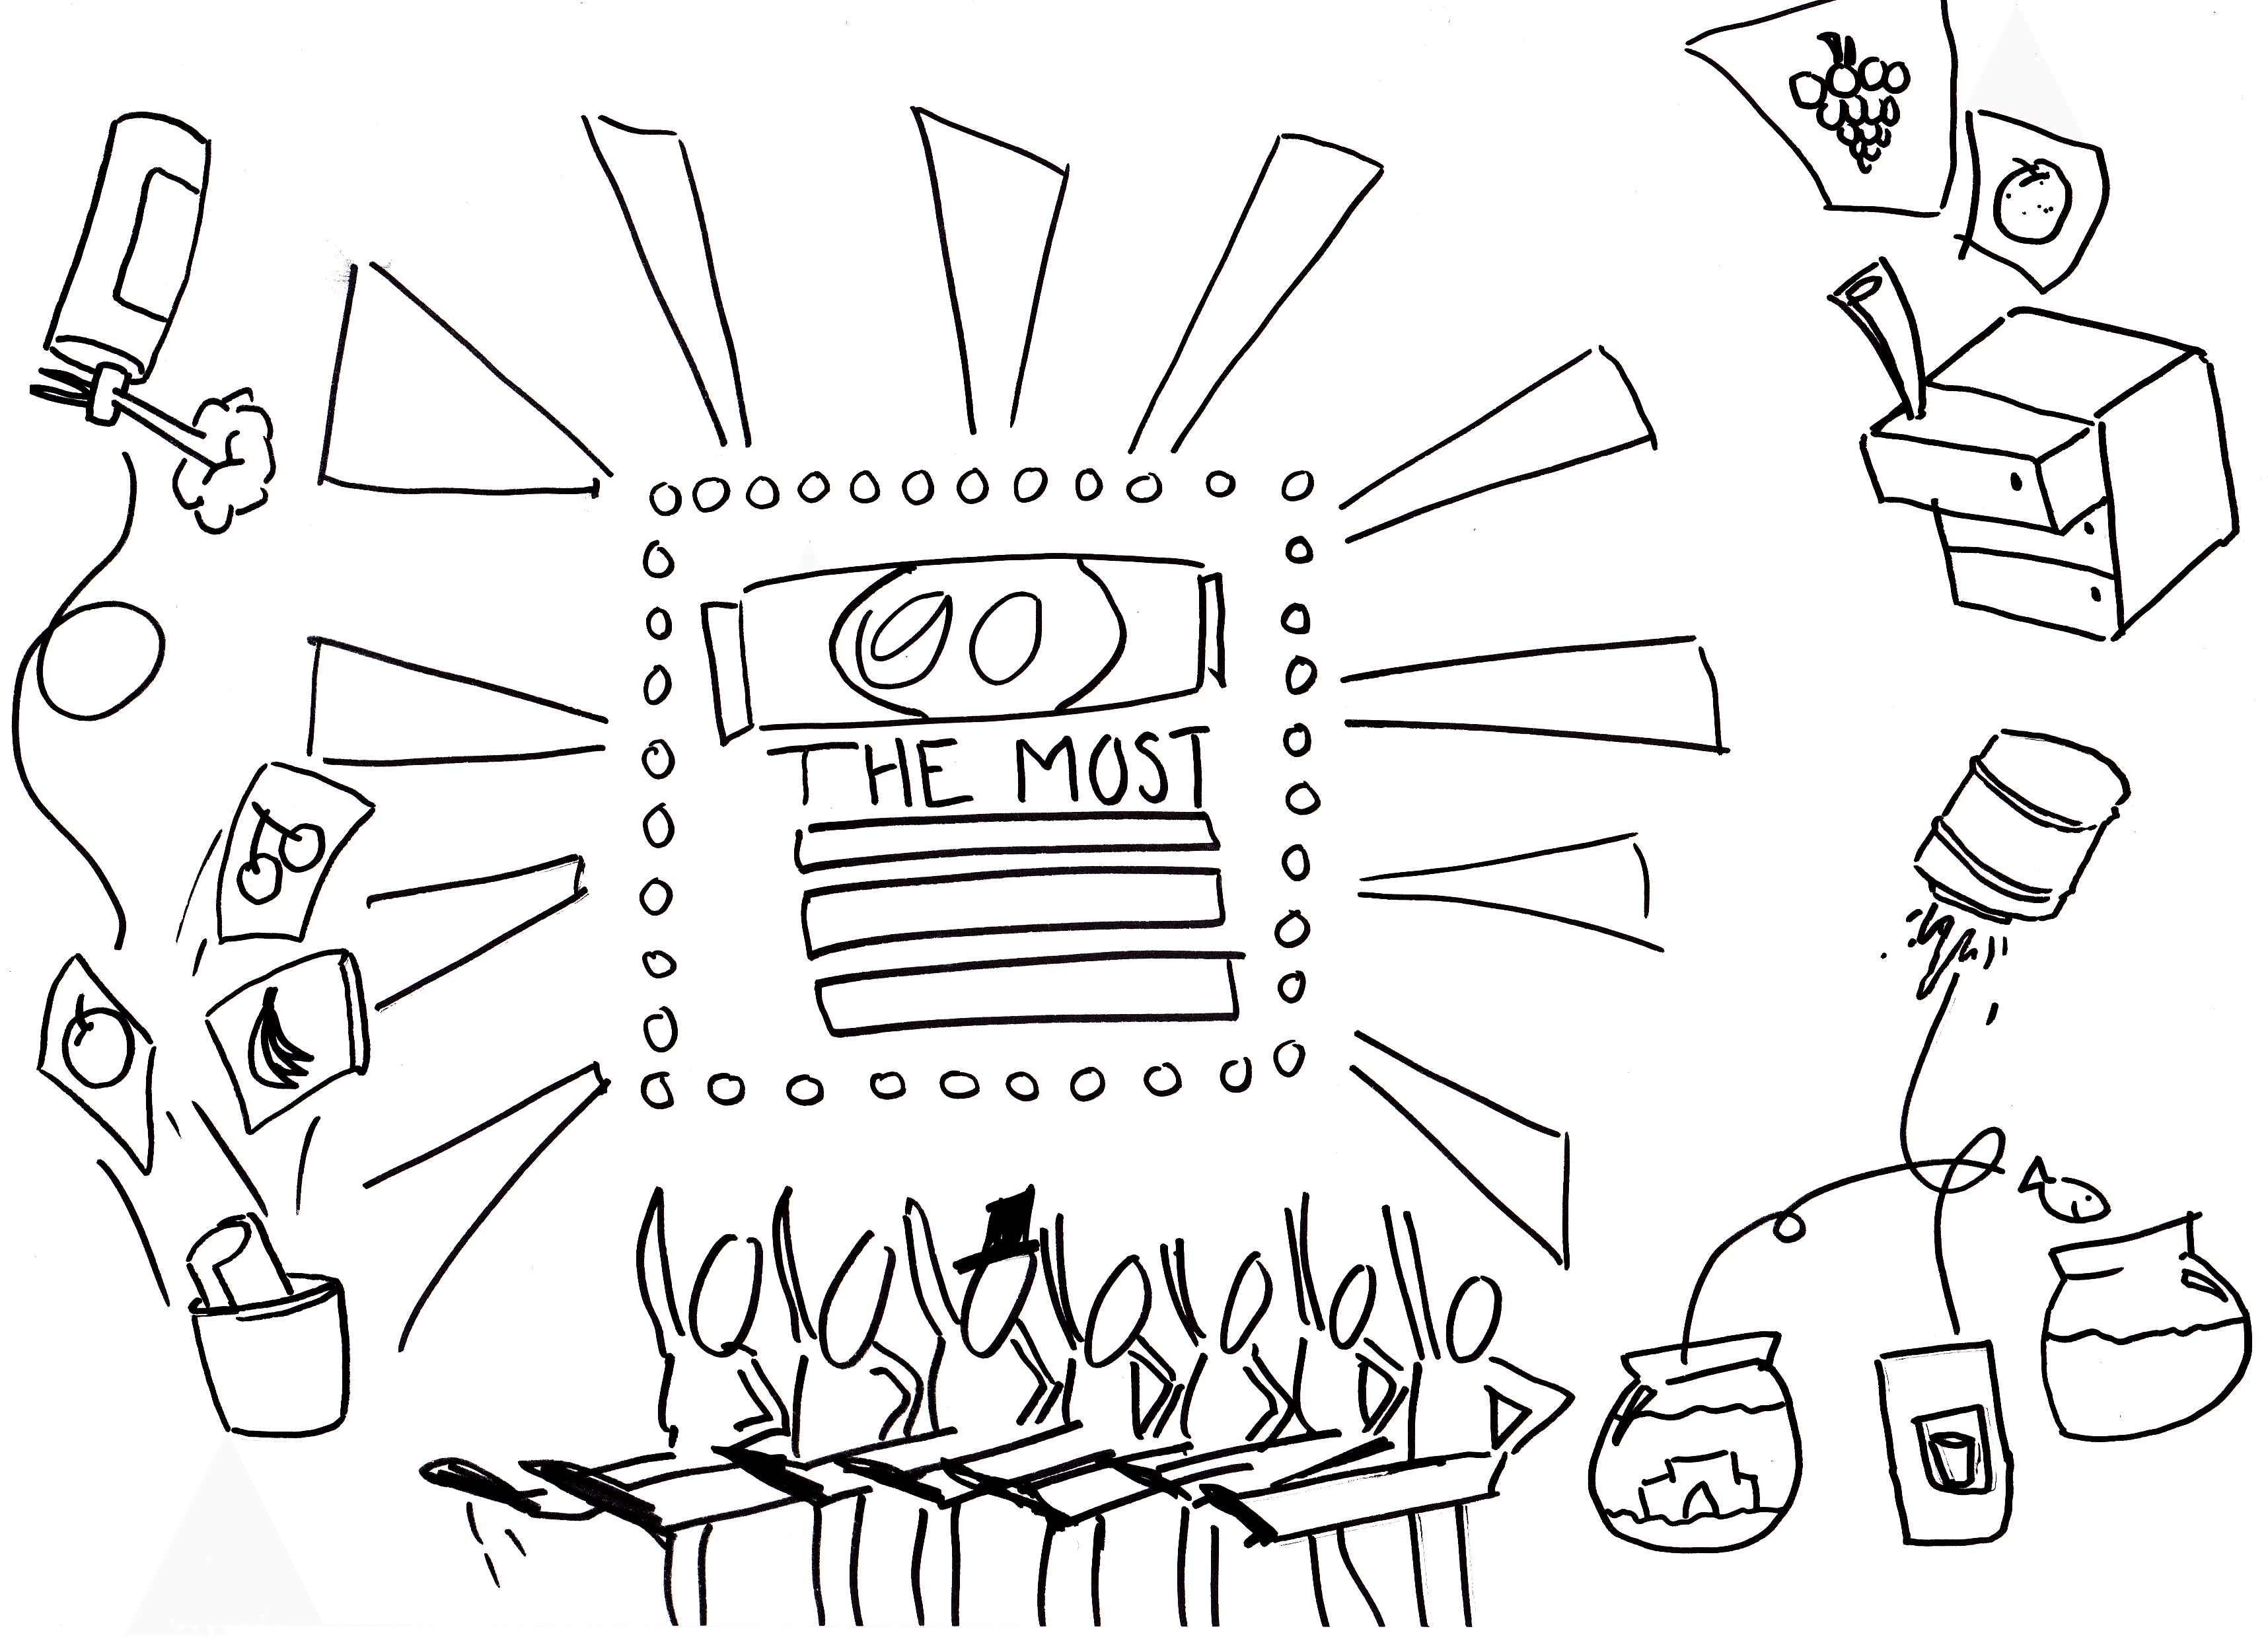 goaheadscamp2